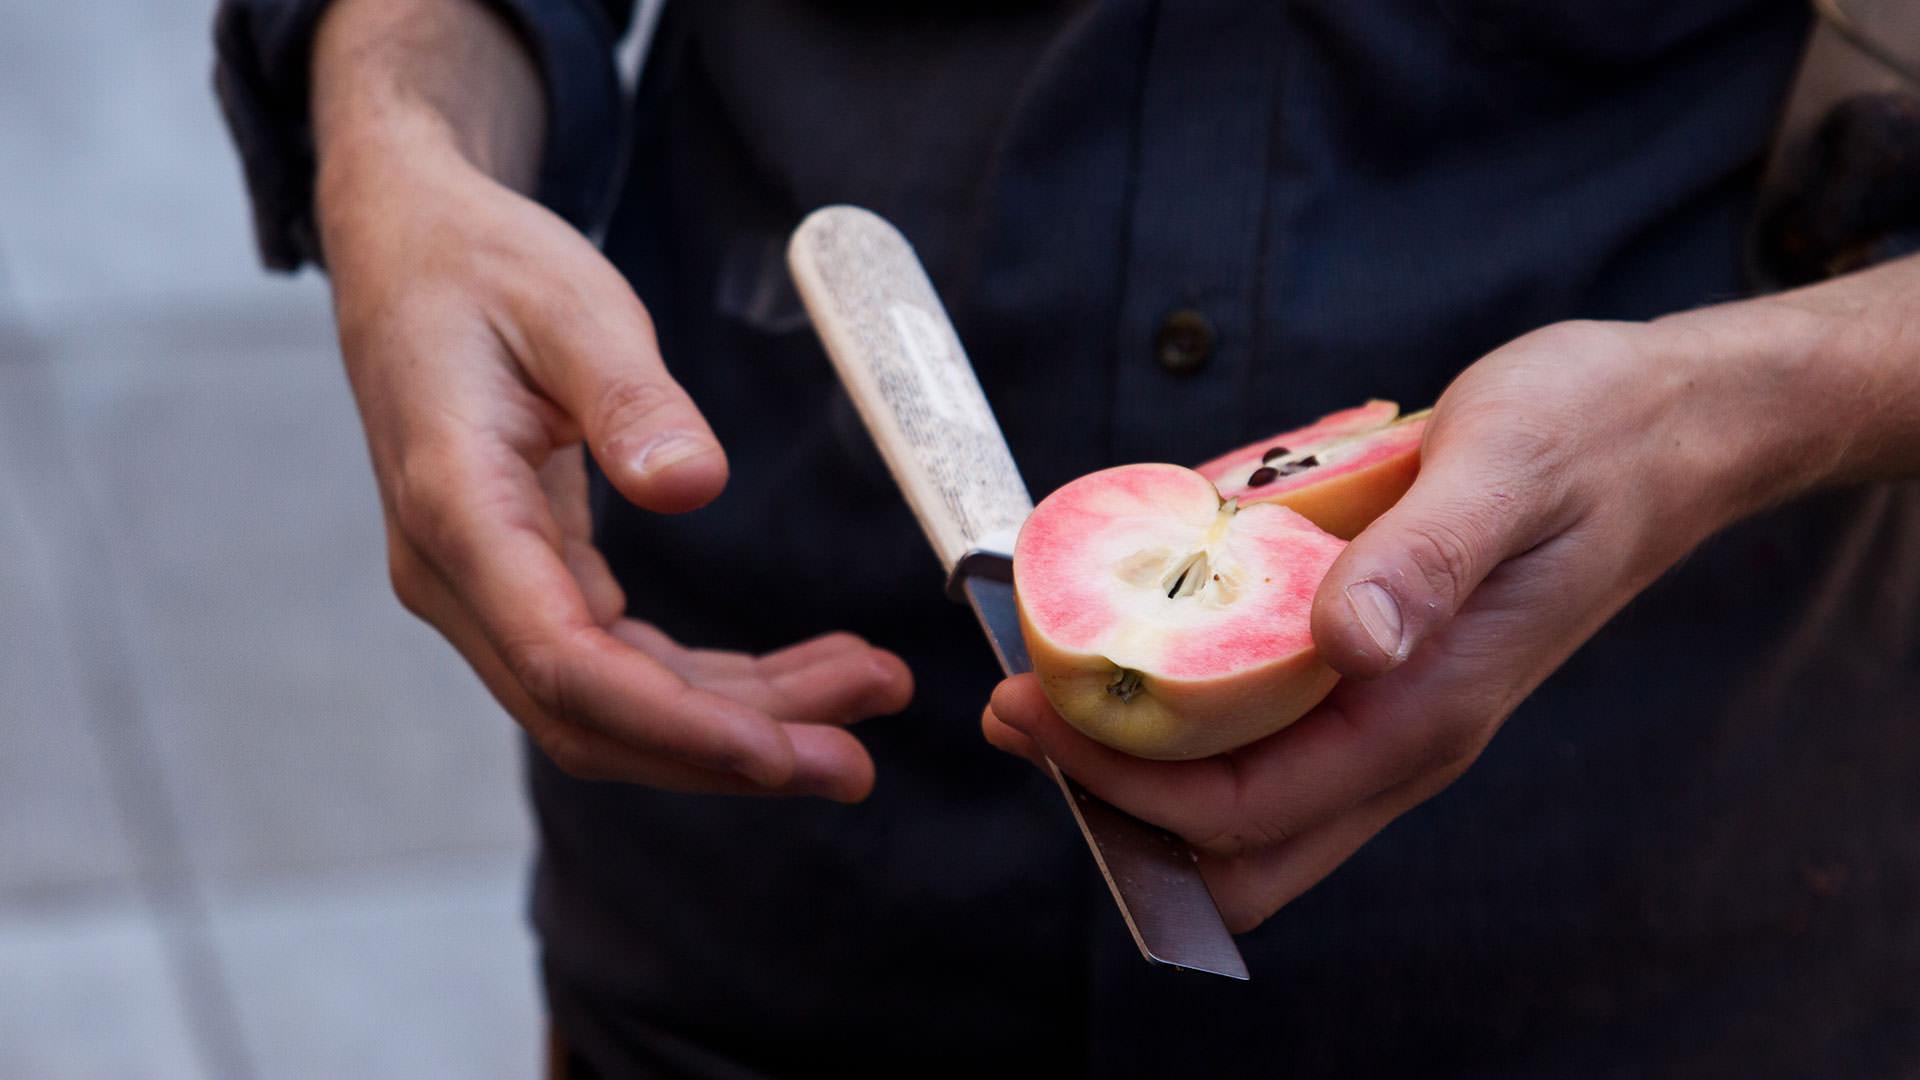 Man cutting peach with knife